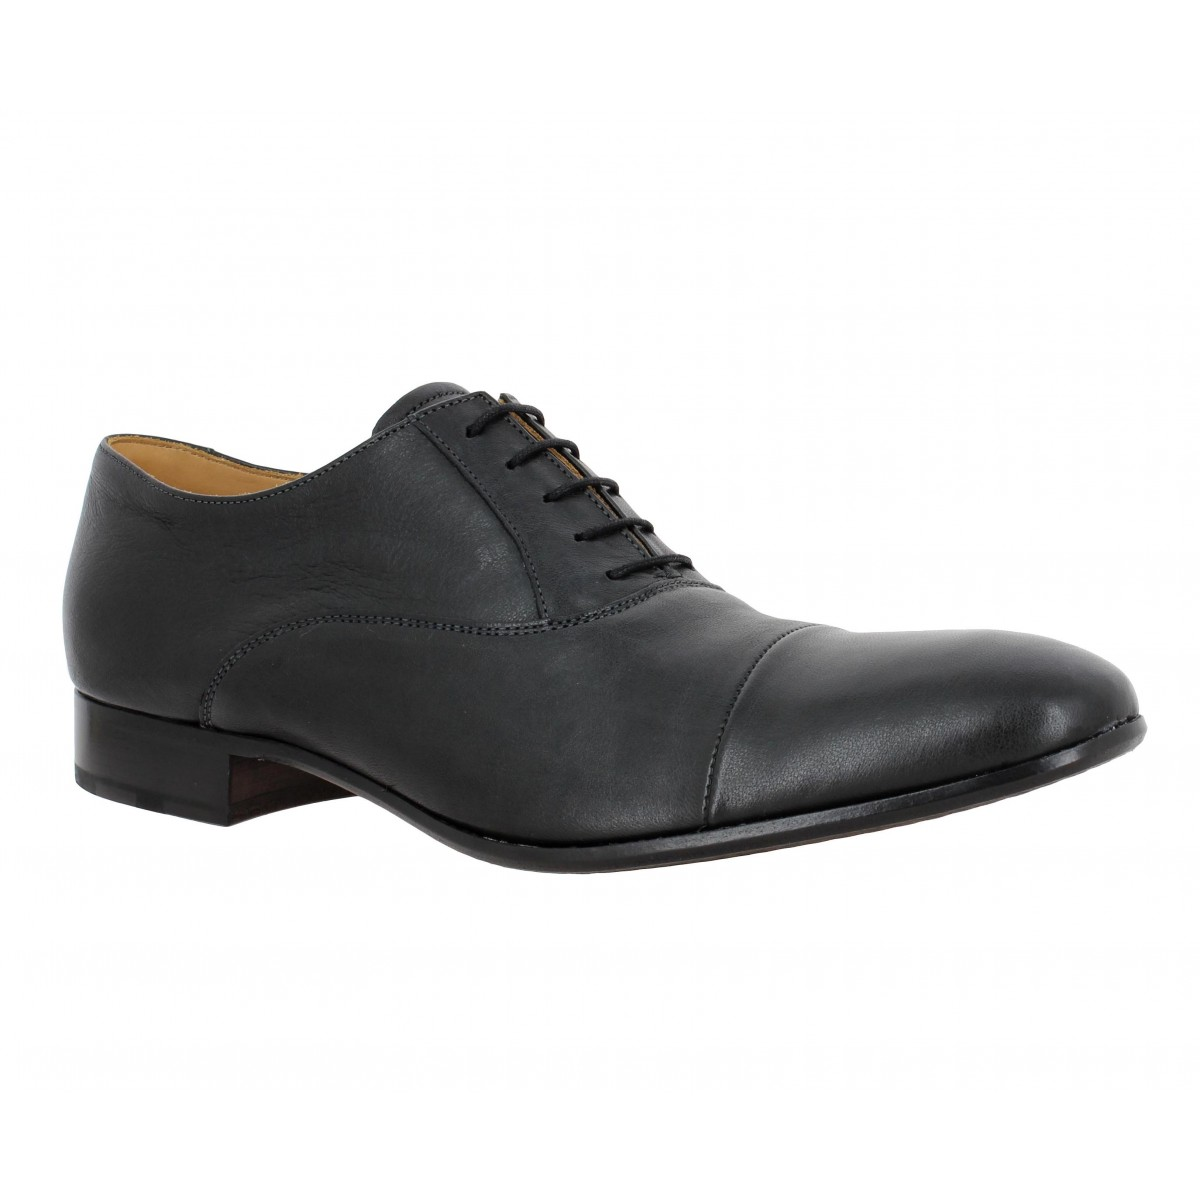 Chaussures à lacets HESCHUNG Malus Safari cuir Homme Noir